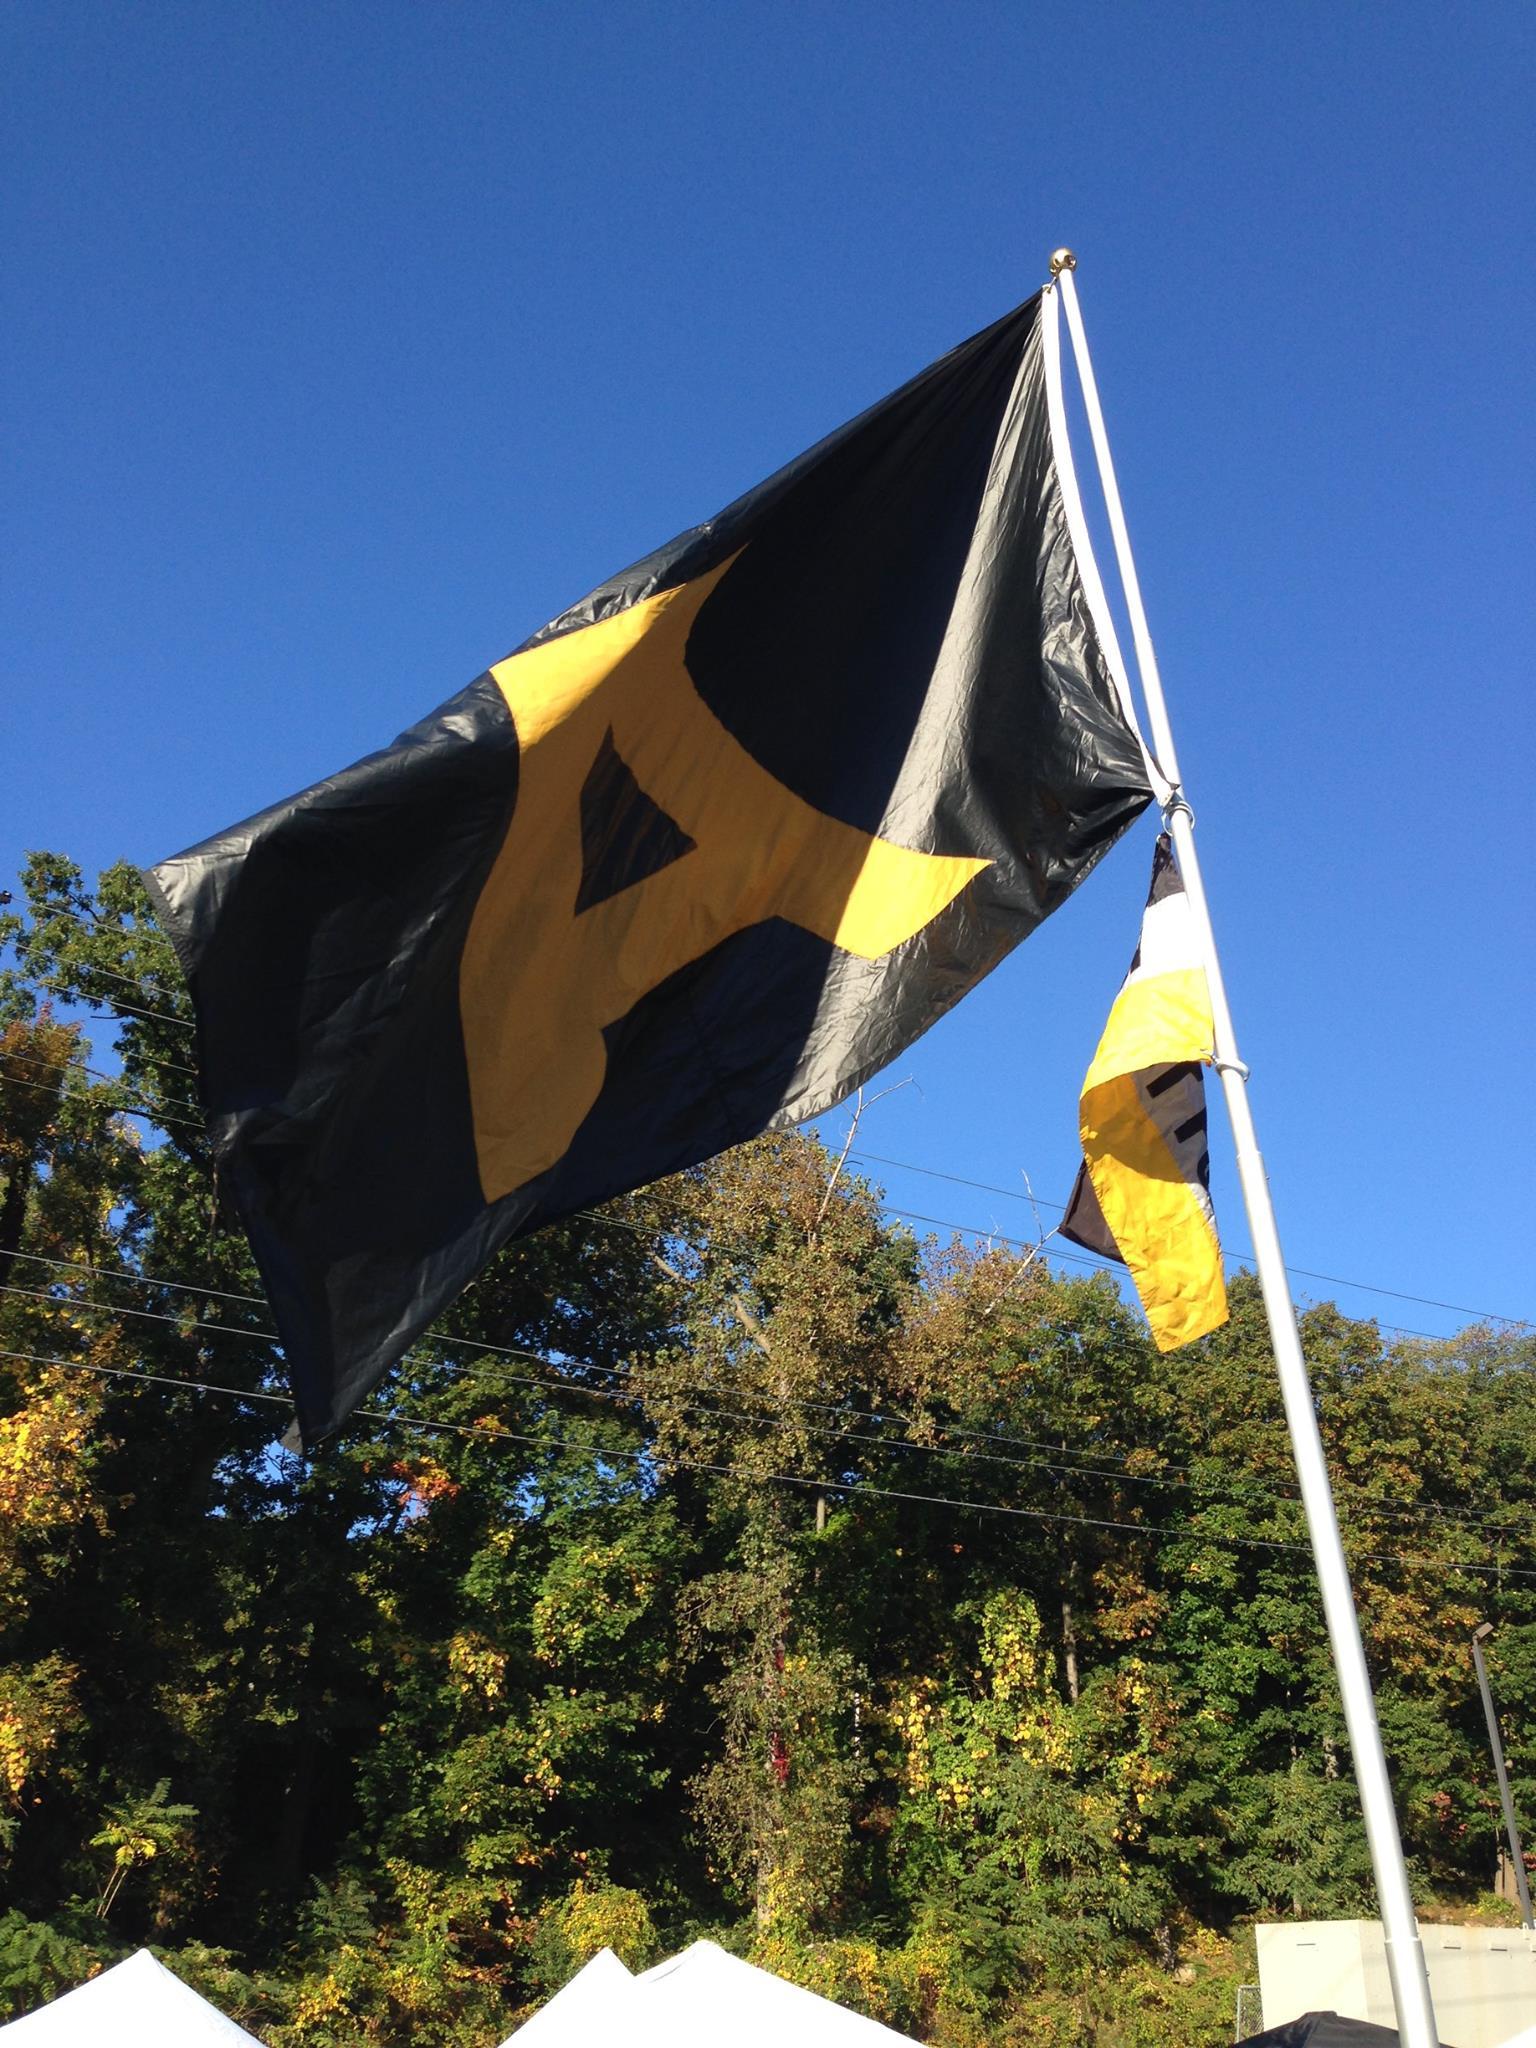 tg flag.jpg